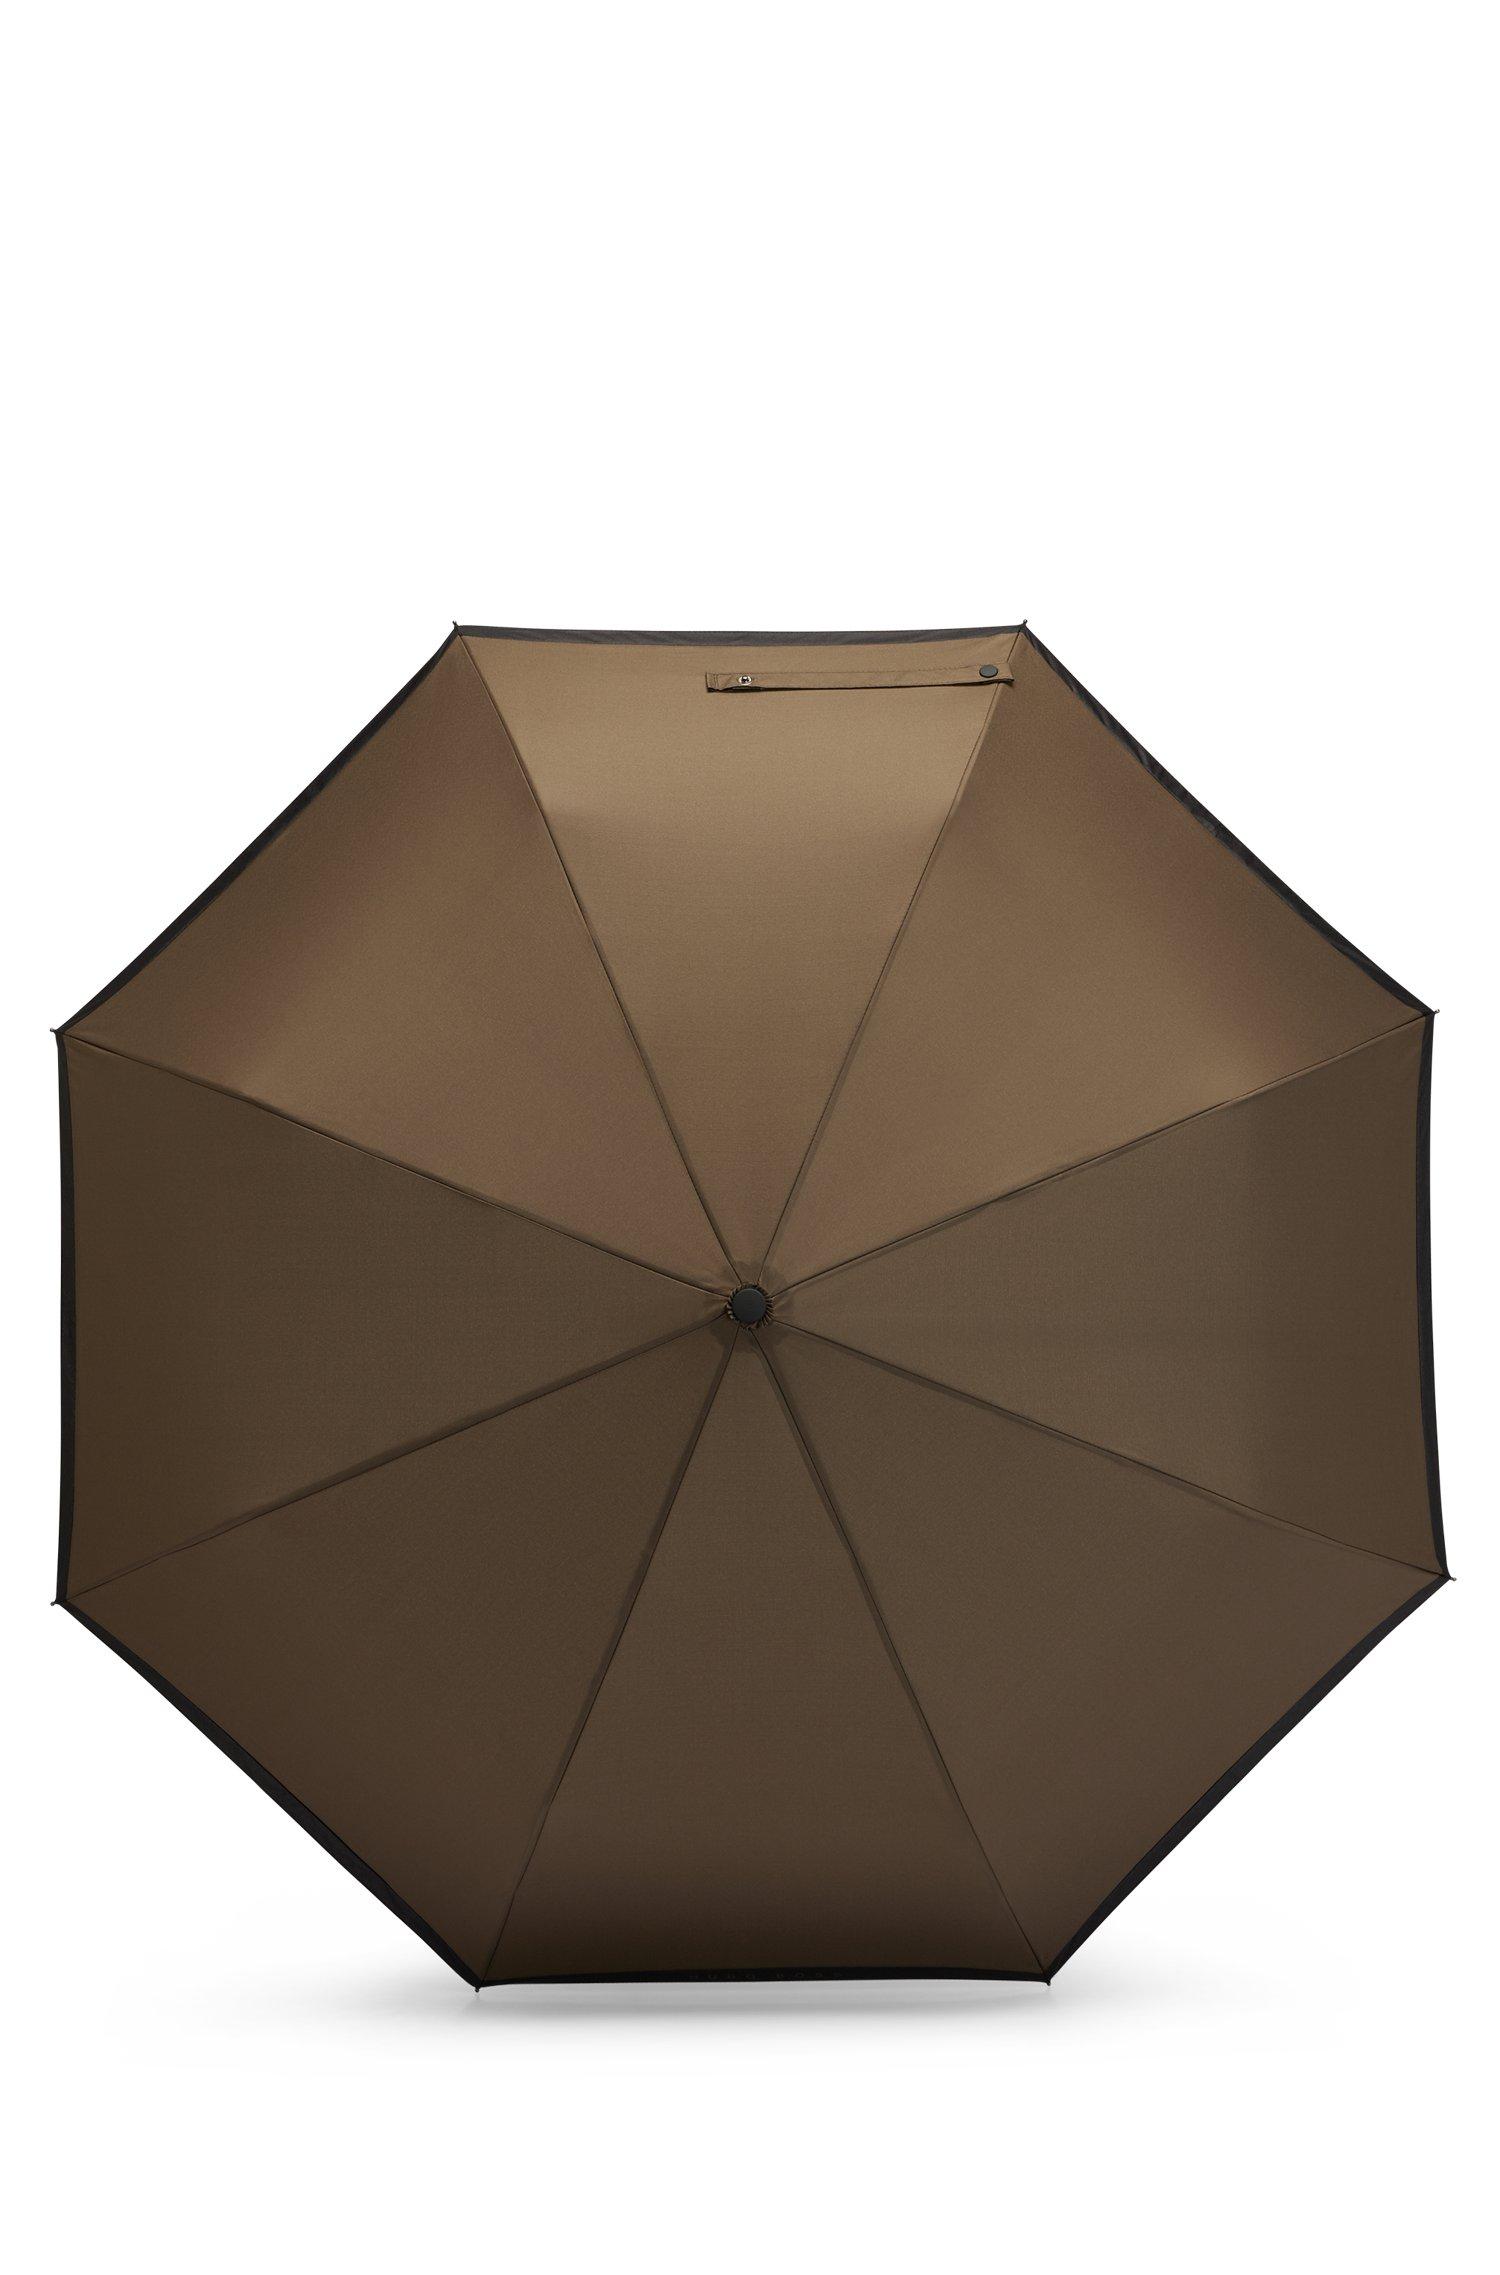 Khaki pocket umbrella with black border, Black